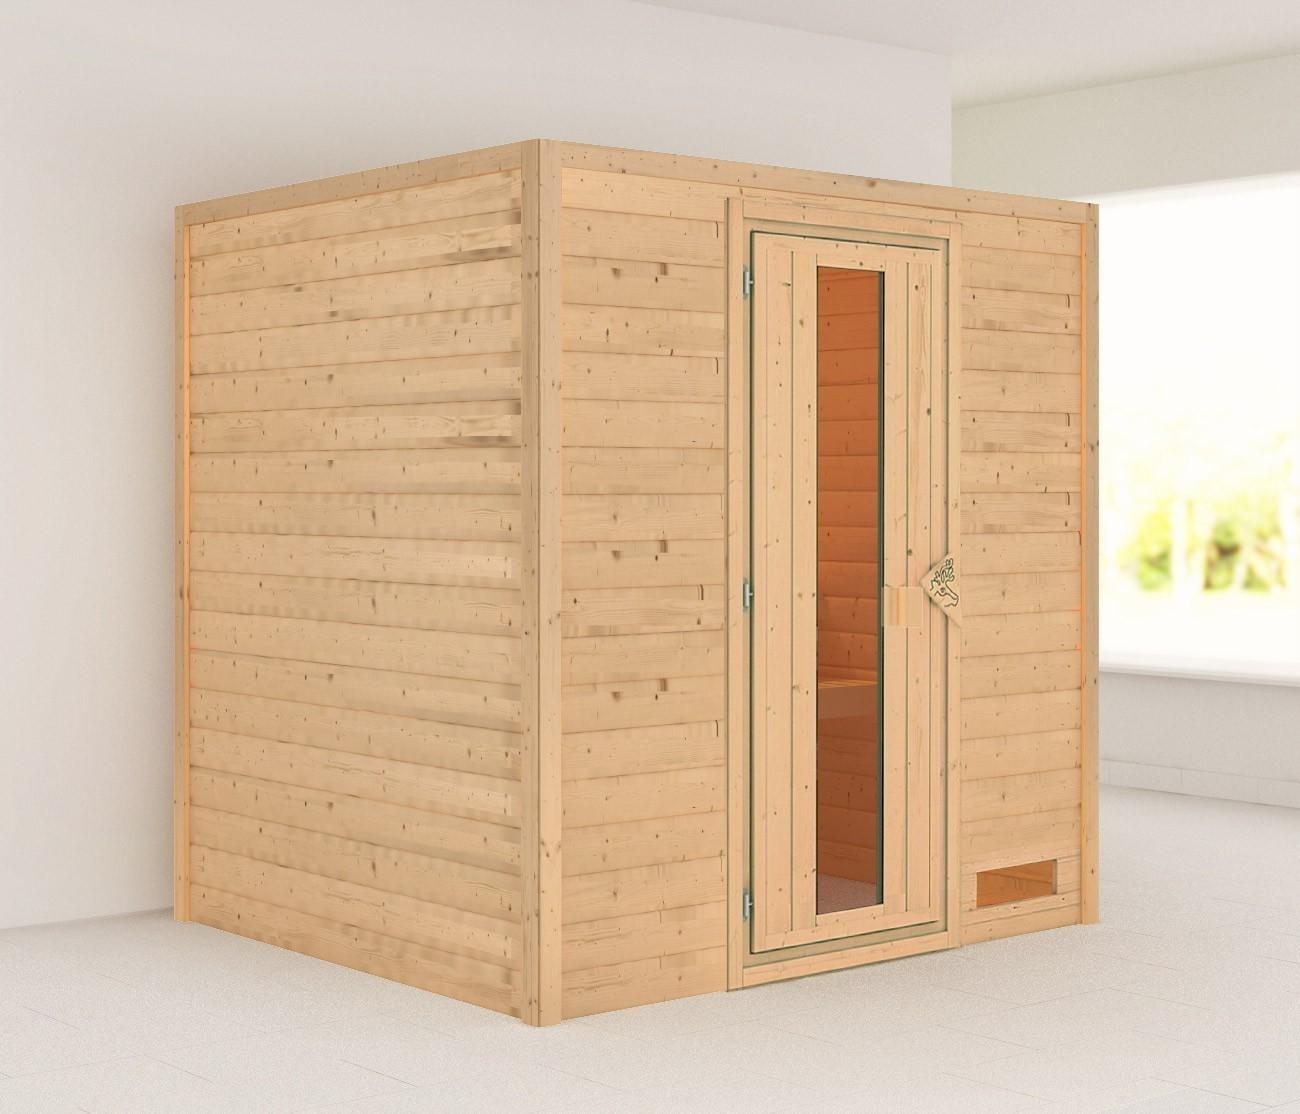 Woodfeeling Sauna Anja 38mm ohne Ofen Holztür Bild 1